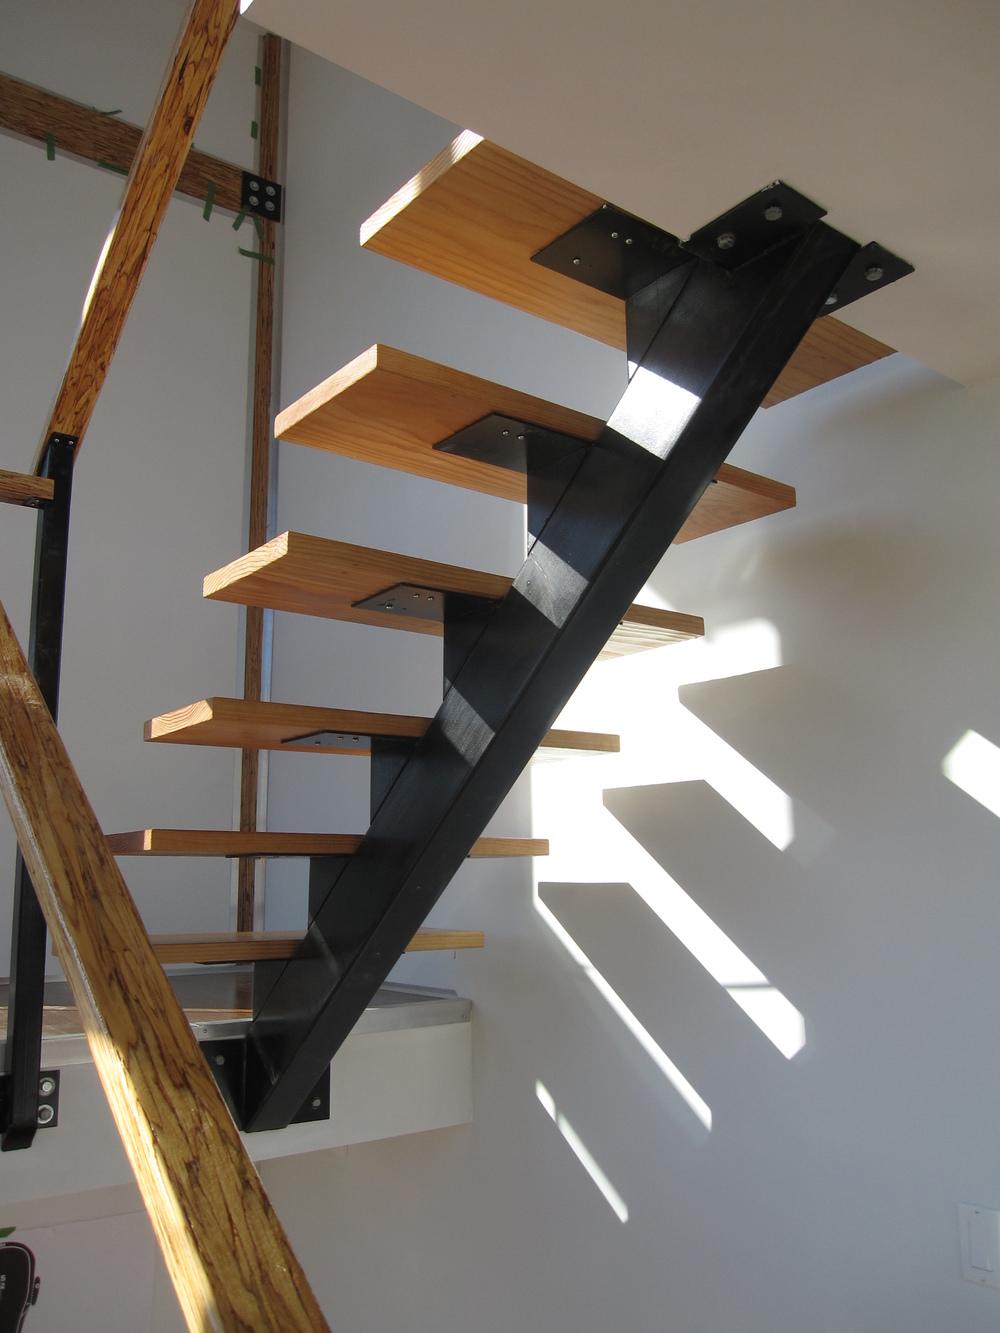 Regenerate Construction: Steel Staircase + Fir Treads